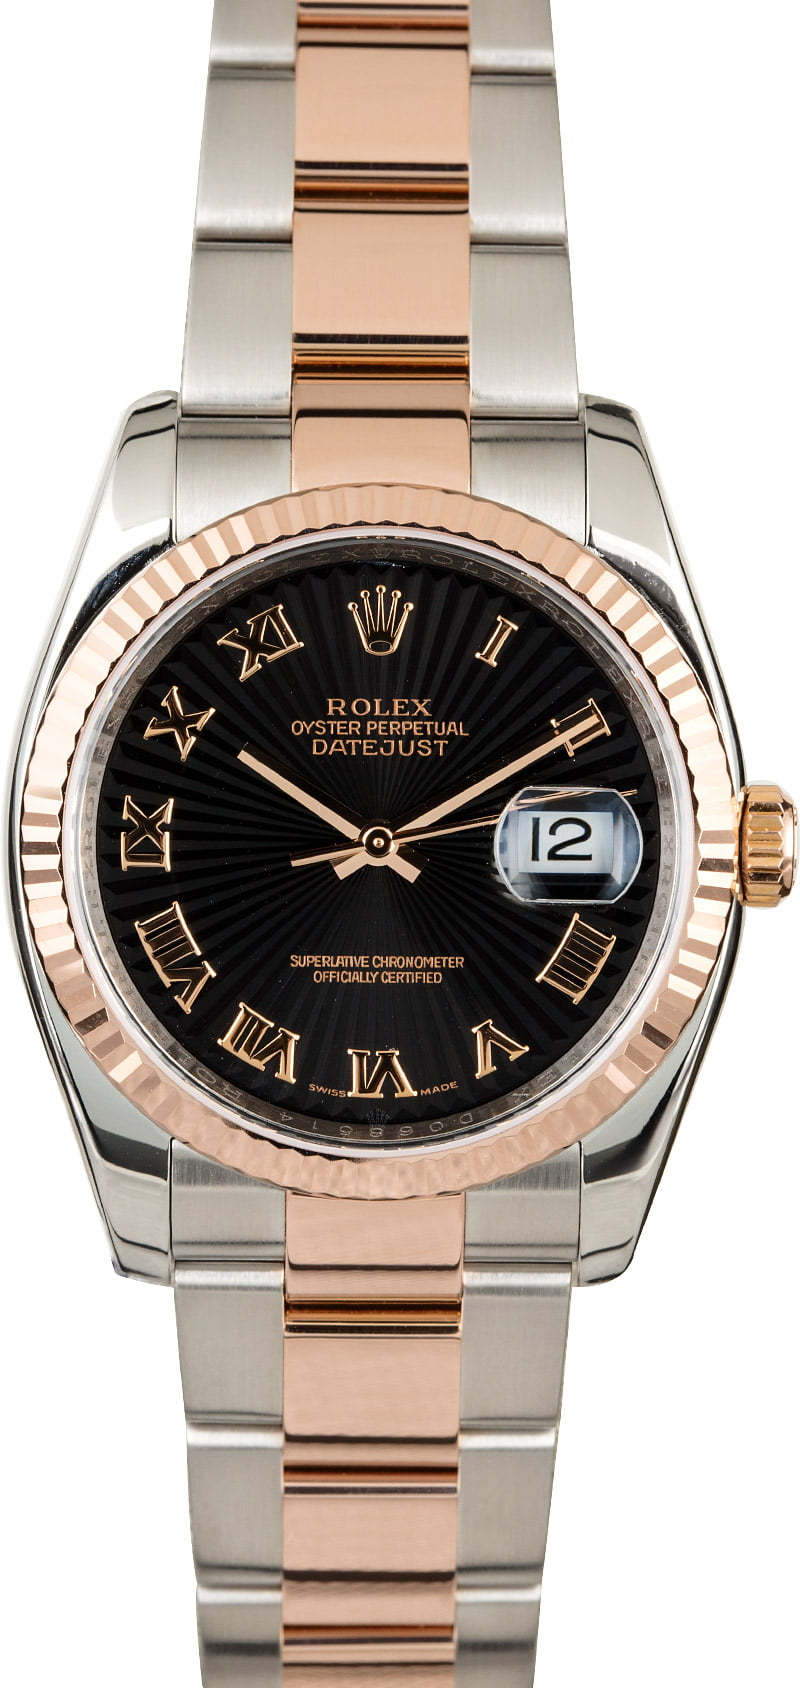 Rolex Datejust vs Omega Aqua TerraComparison